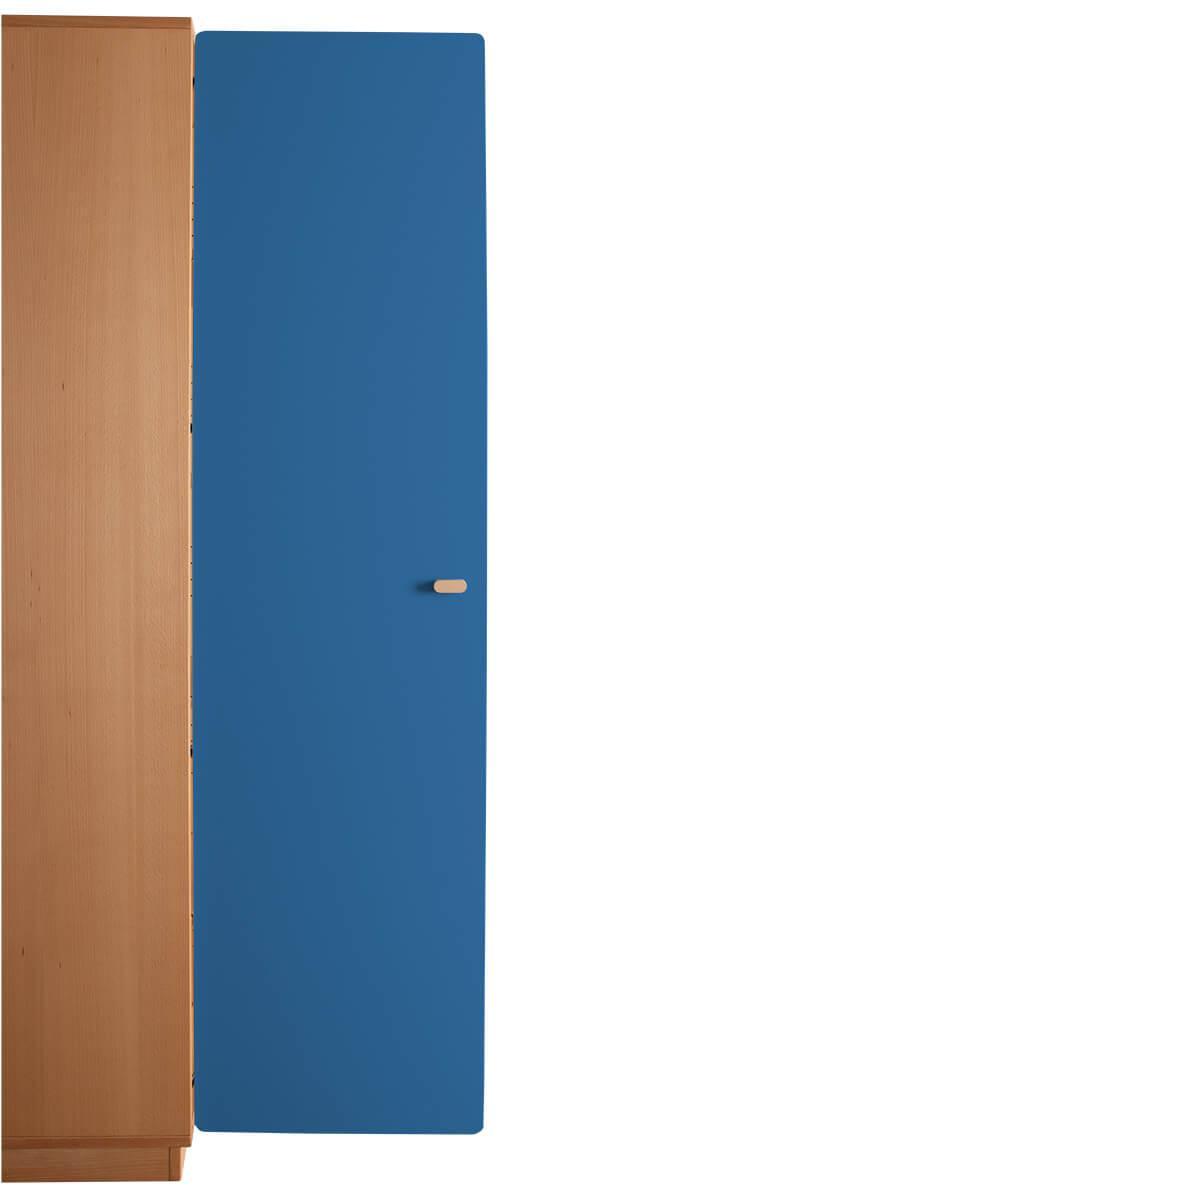 Schranktür 5/5 176cm-Griff DESTYLE de Breuyn MDF dunkelblau-lackiert